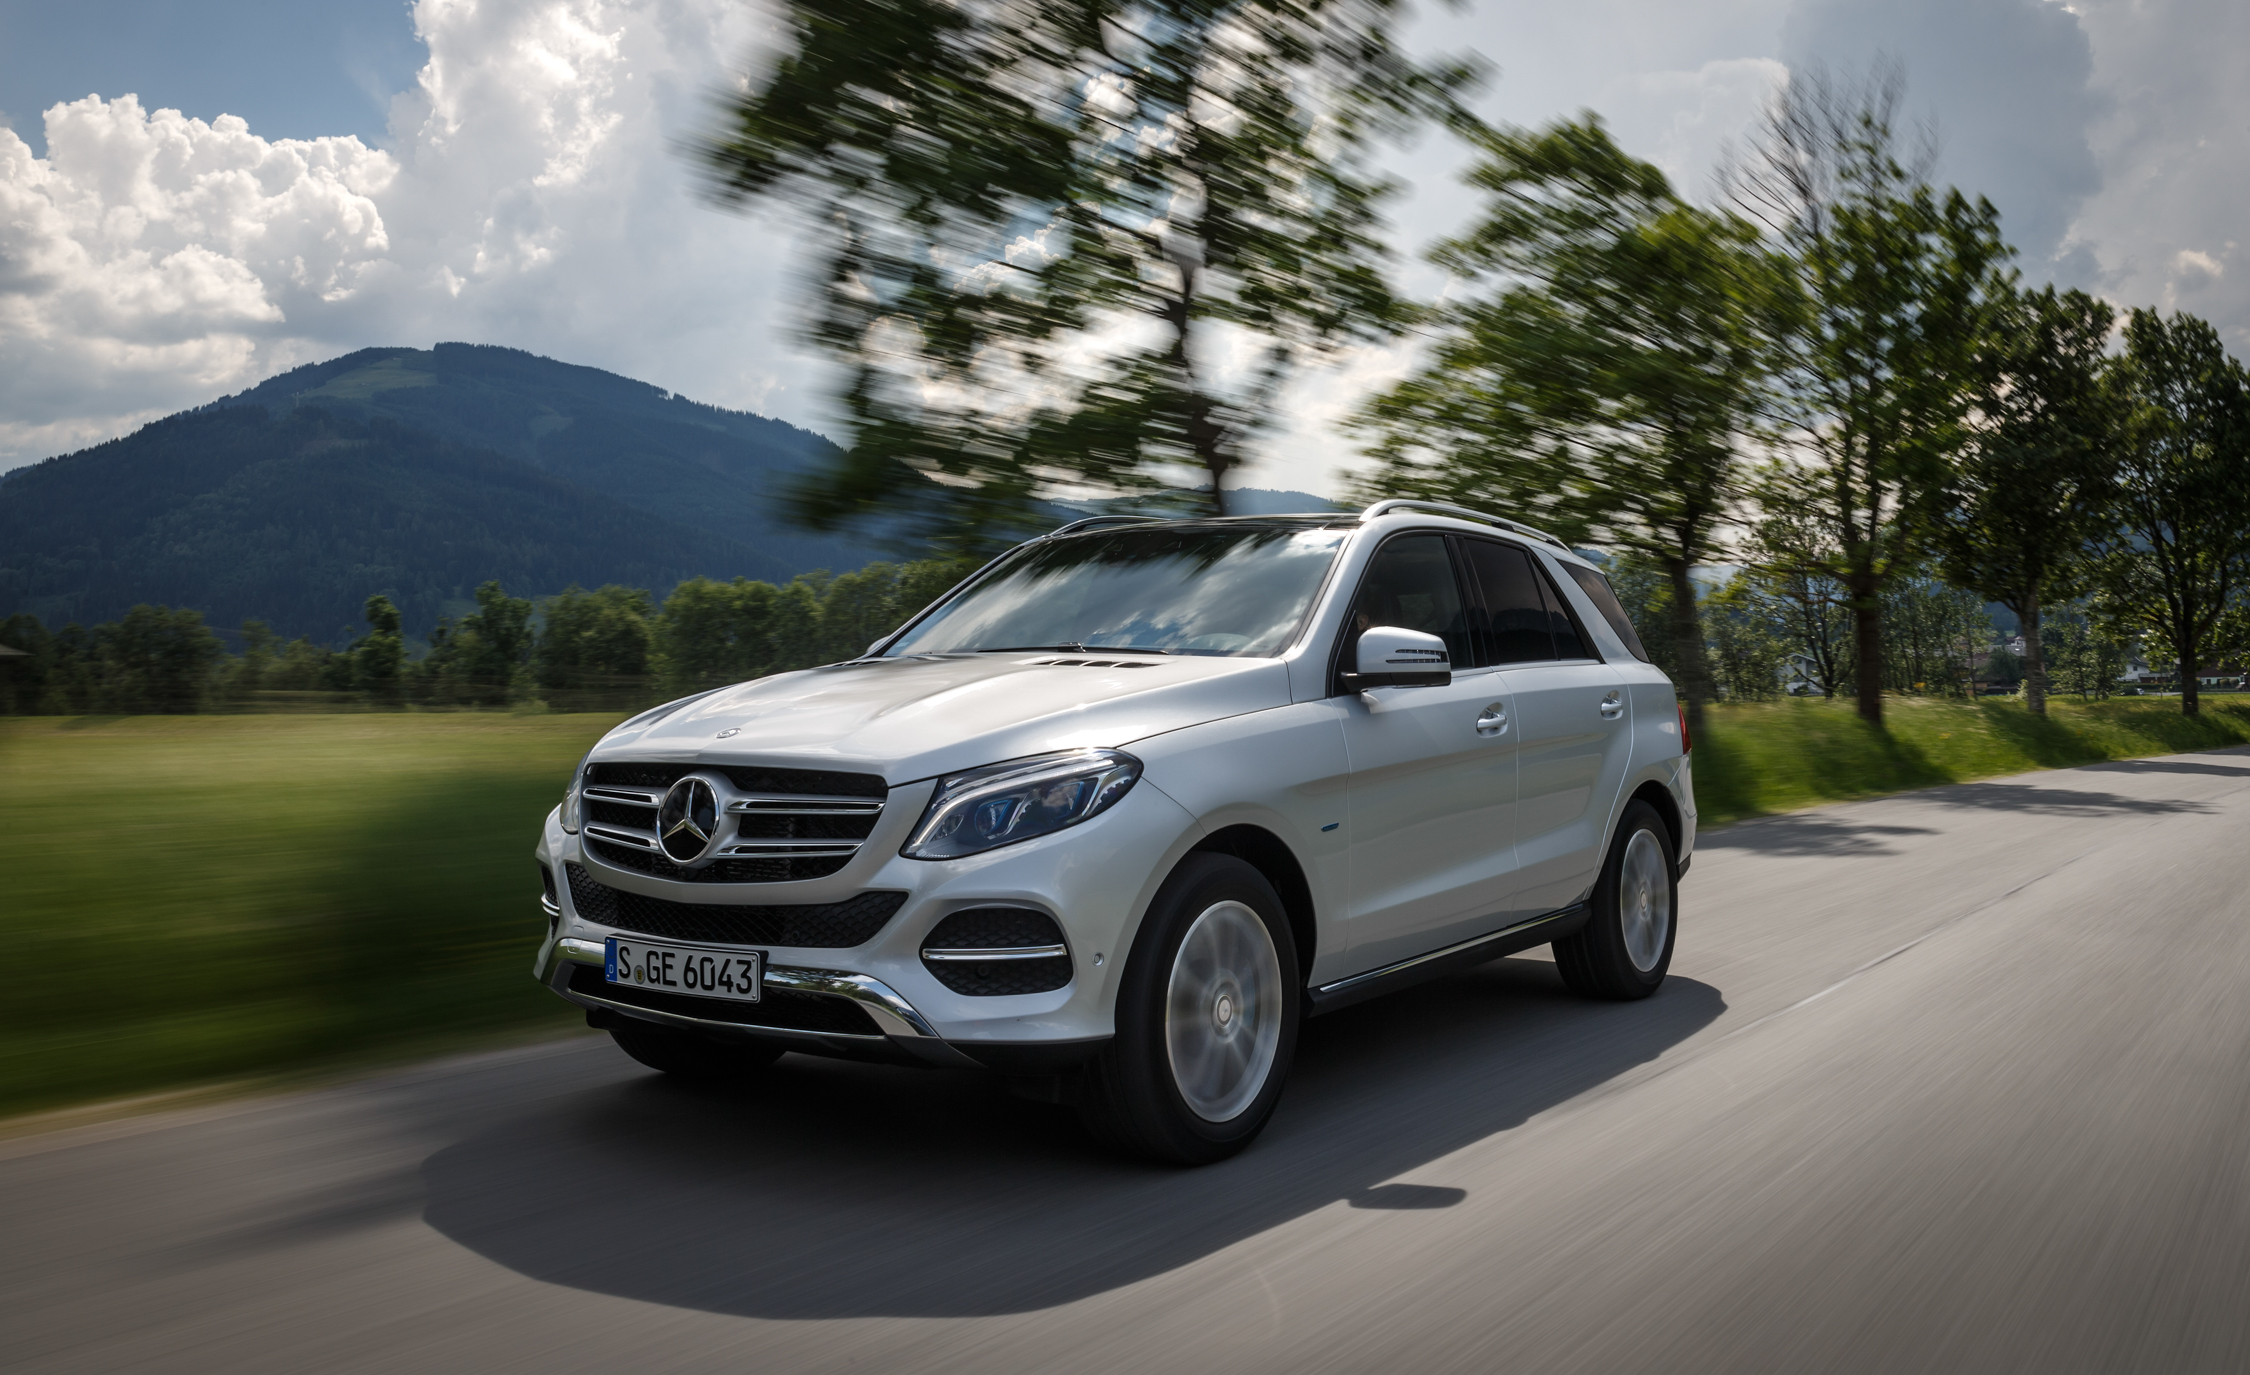 2016 Mercedes Benz GLE500e 4MATIC (Photo 38 of 43)